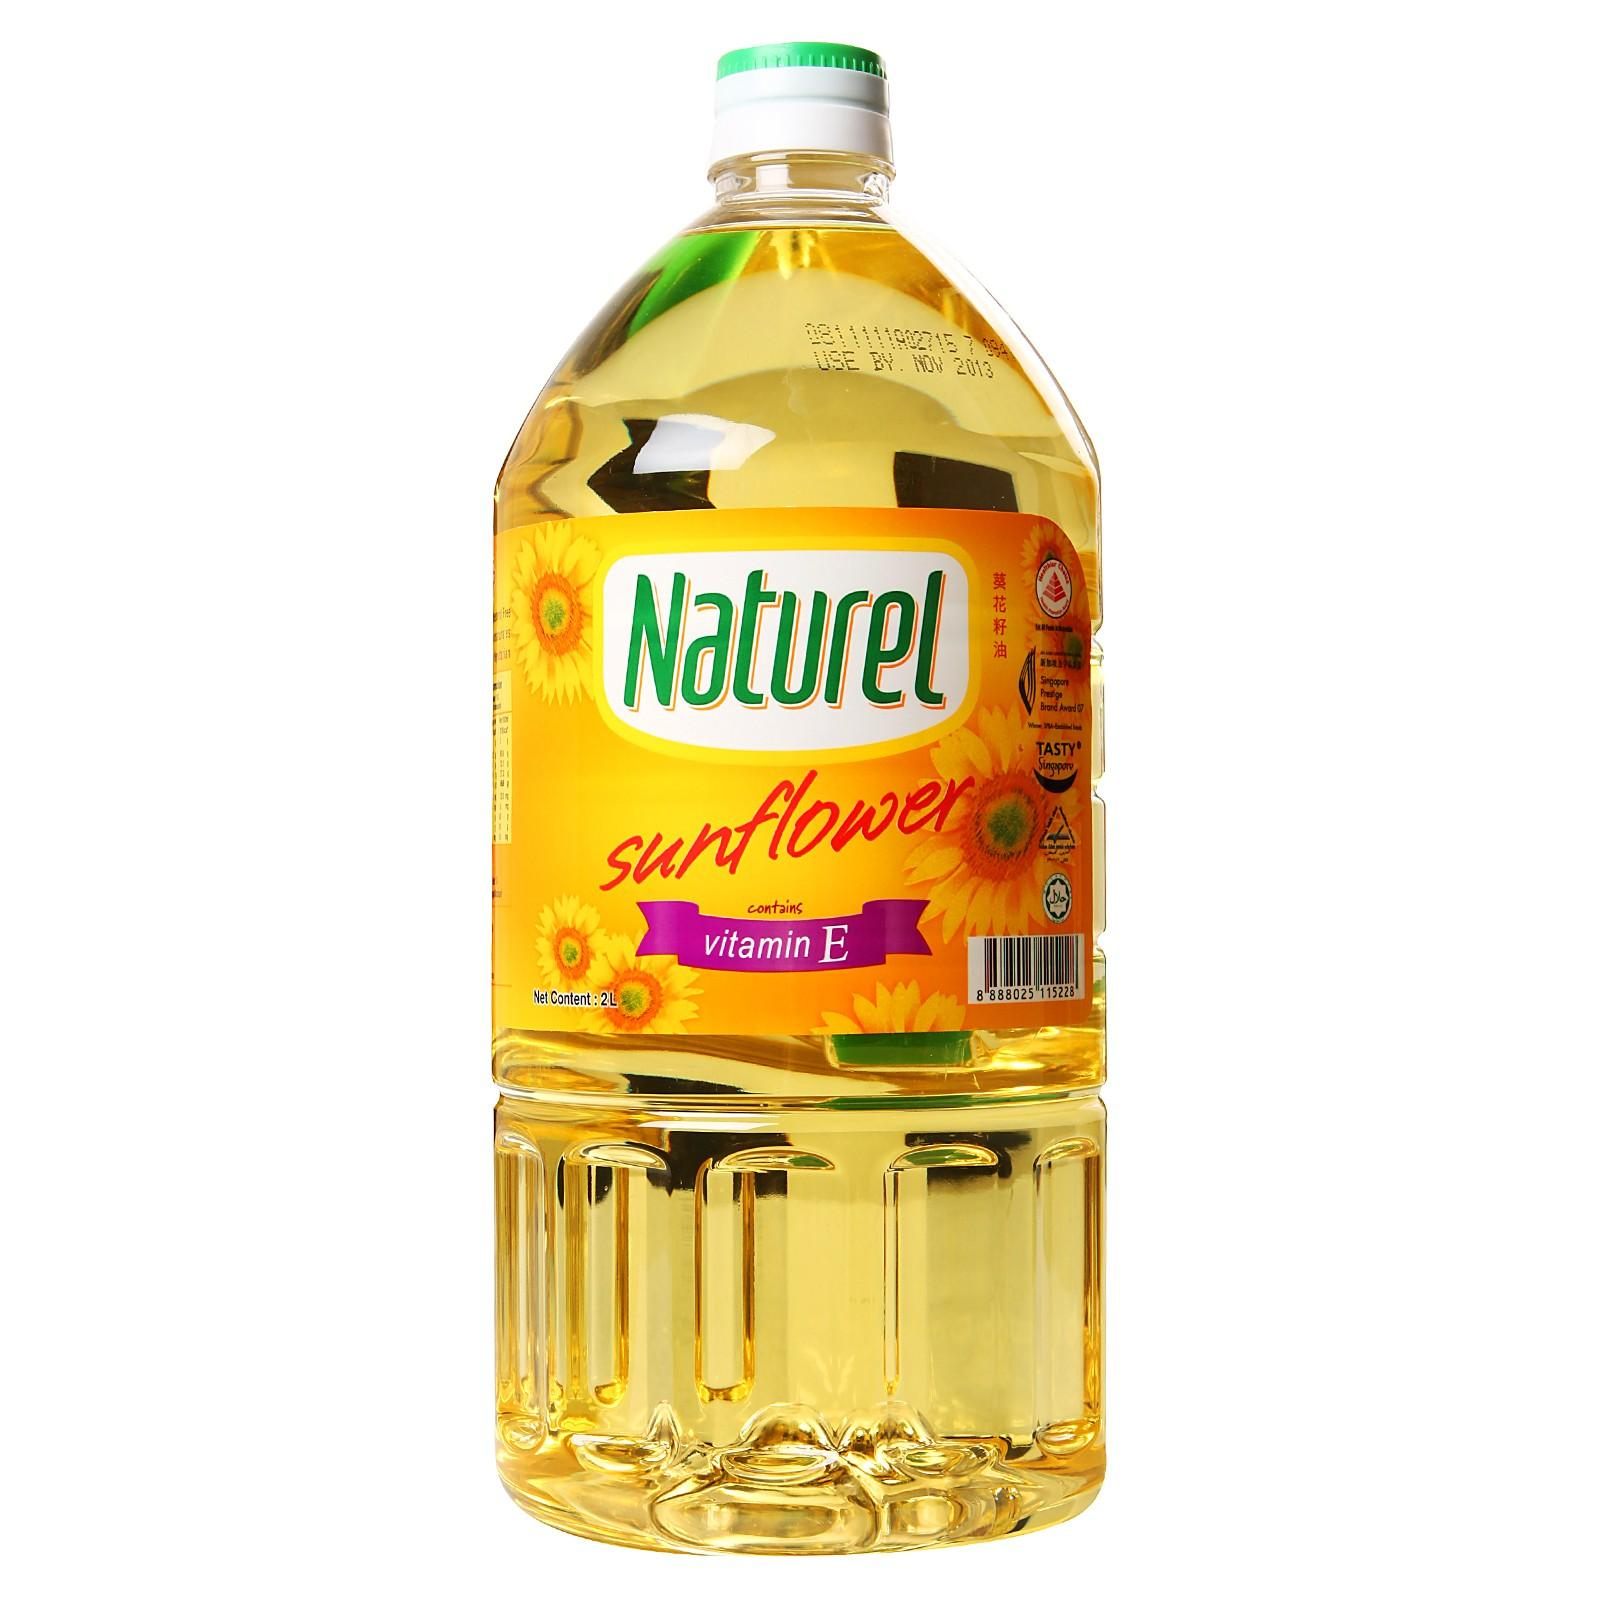 Naturel Sunflower Oil With Vitamin E